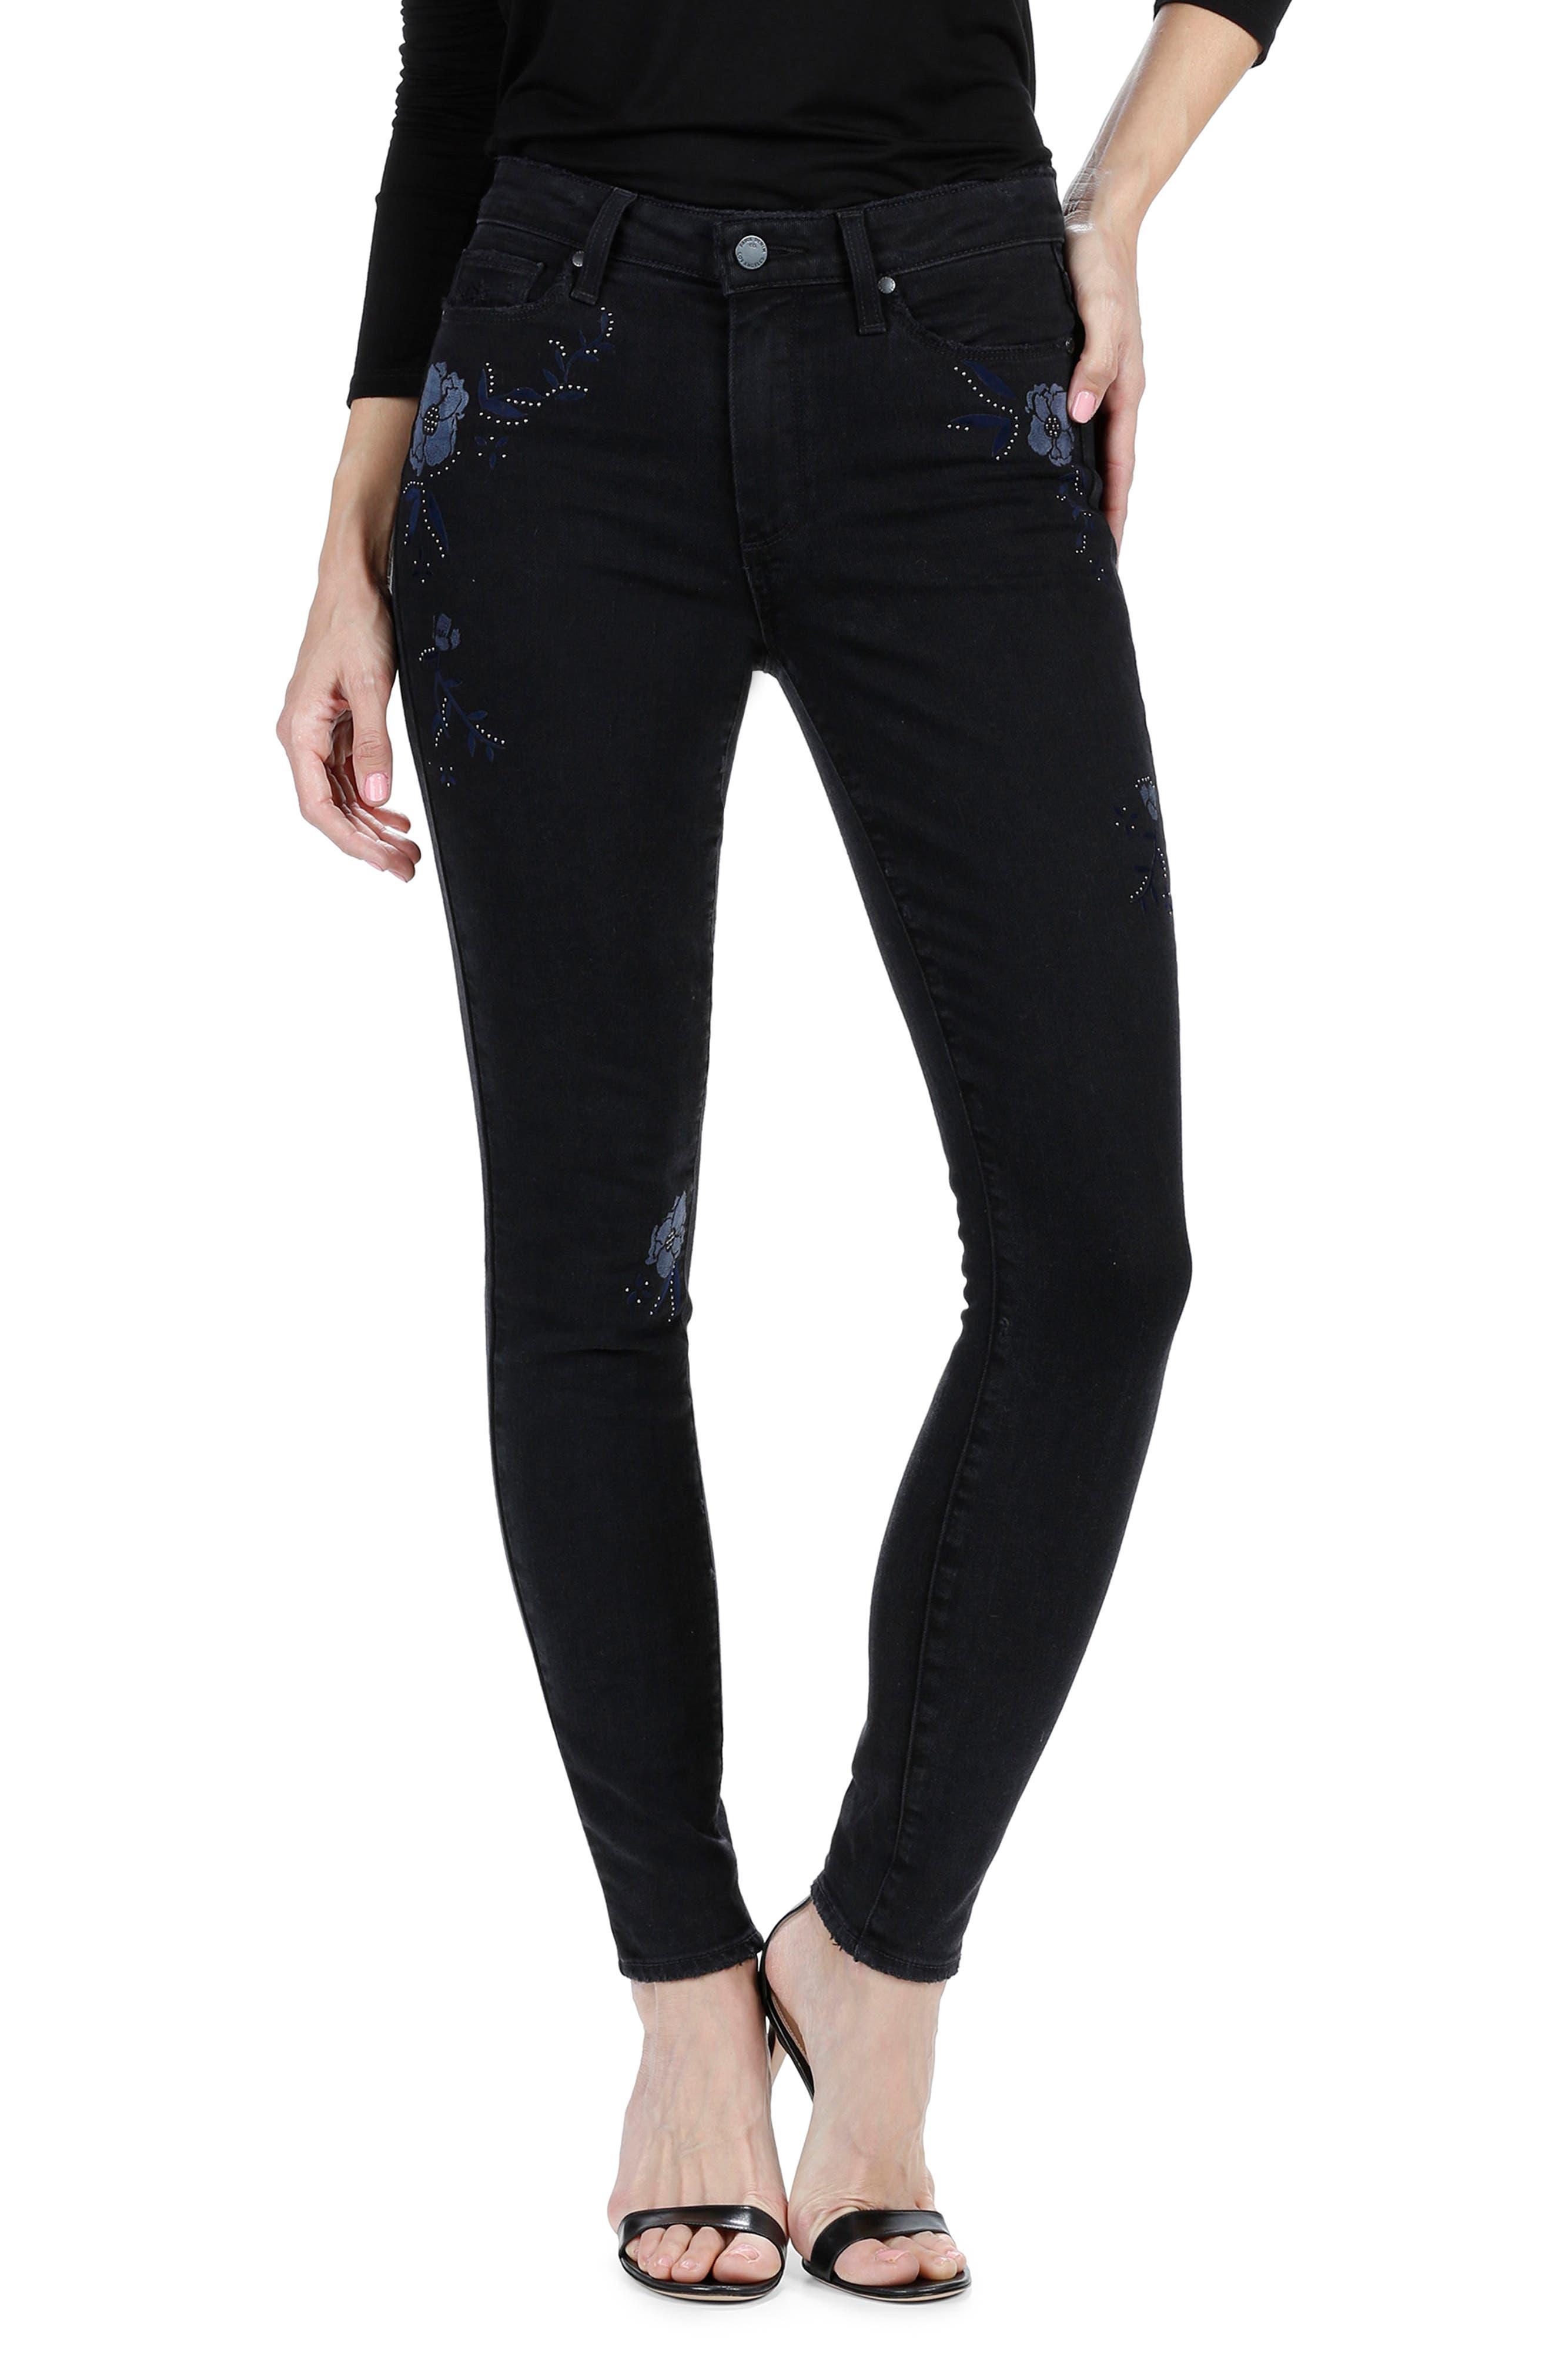 Hoxton High Waist Ultra Skinny Jeans,                             Main thumbnail 1, color,                             001